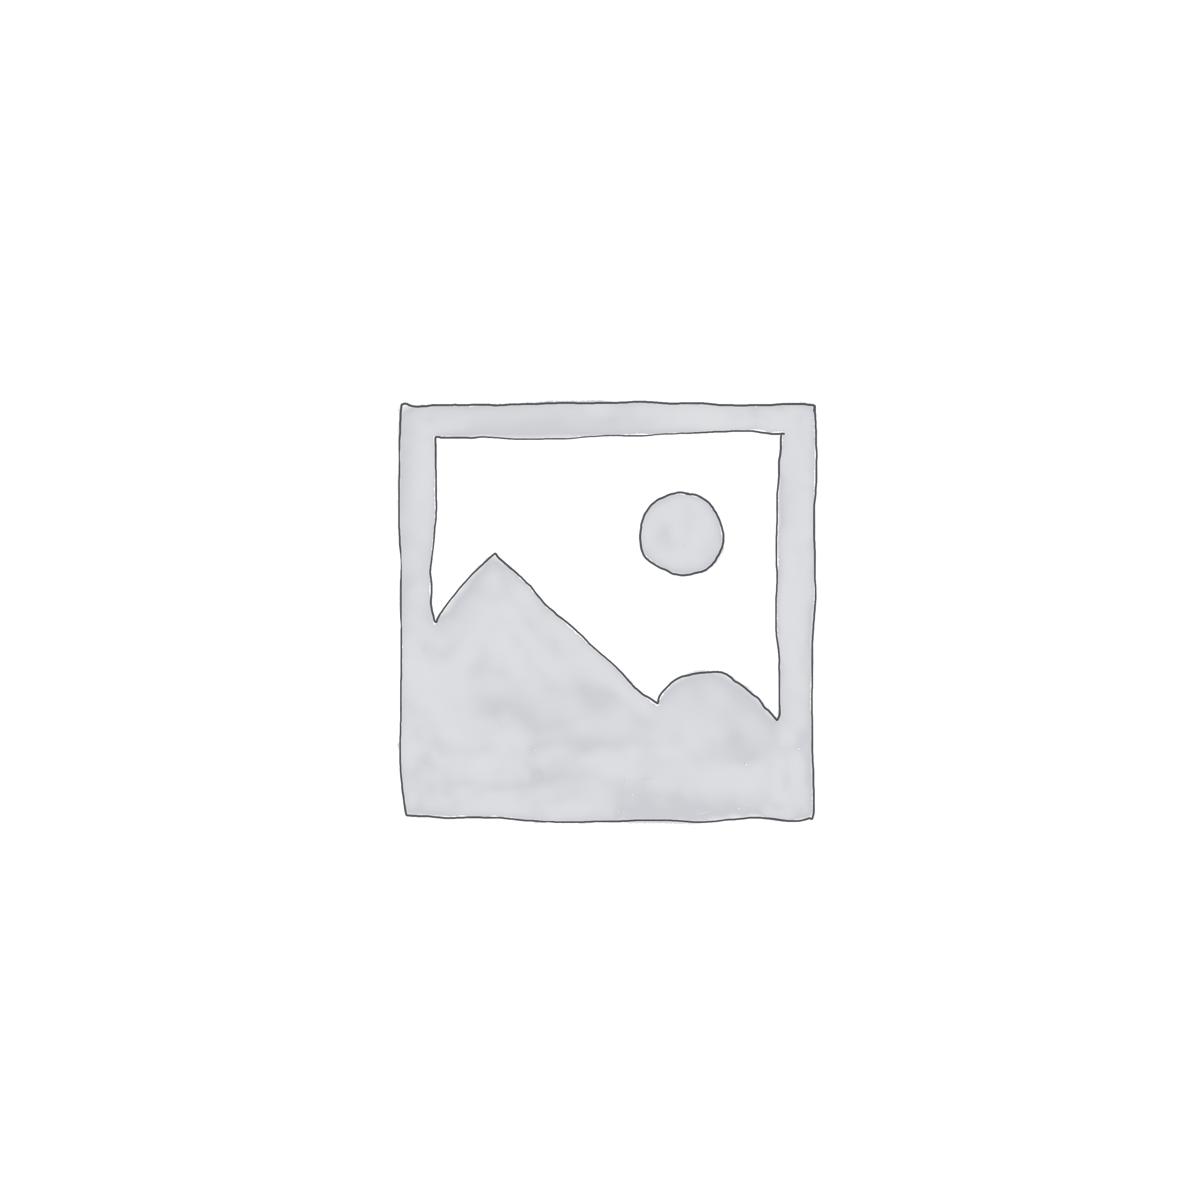 Geometric Circle Pattern Wallpaper Mural